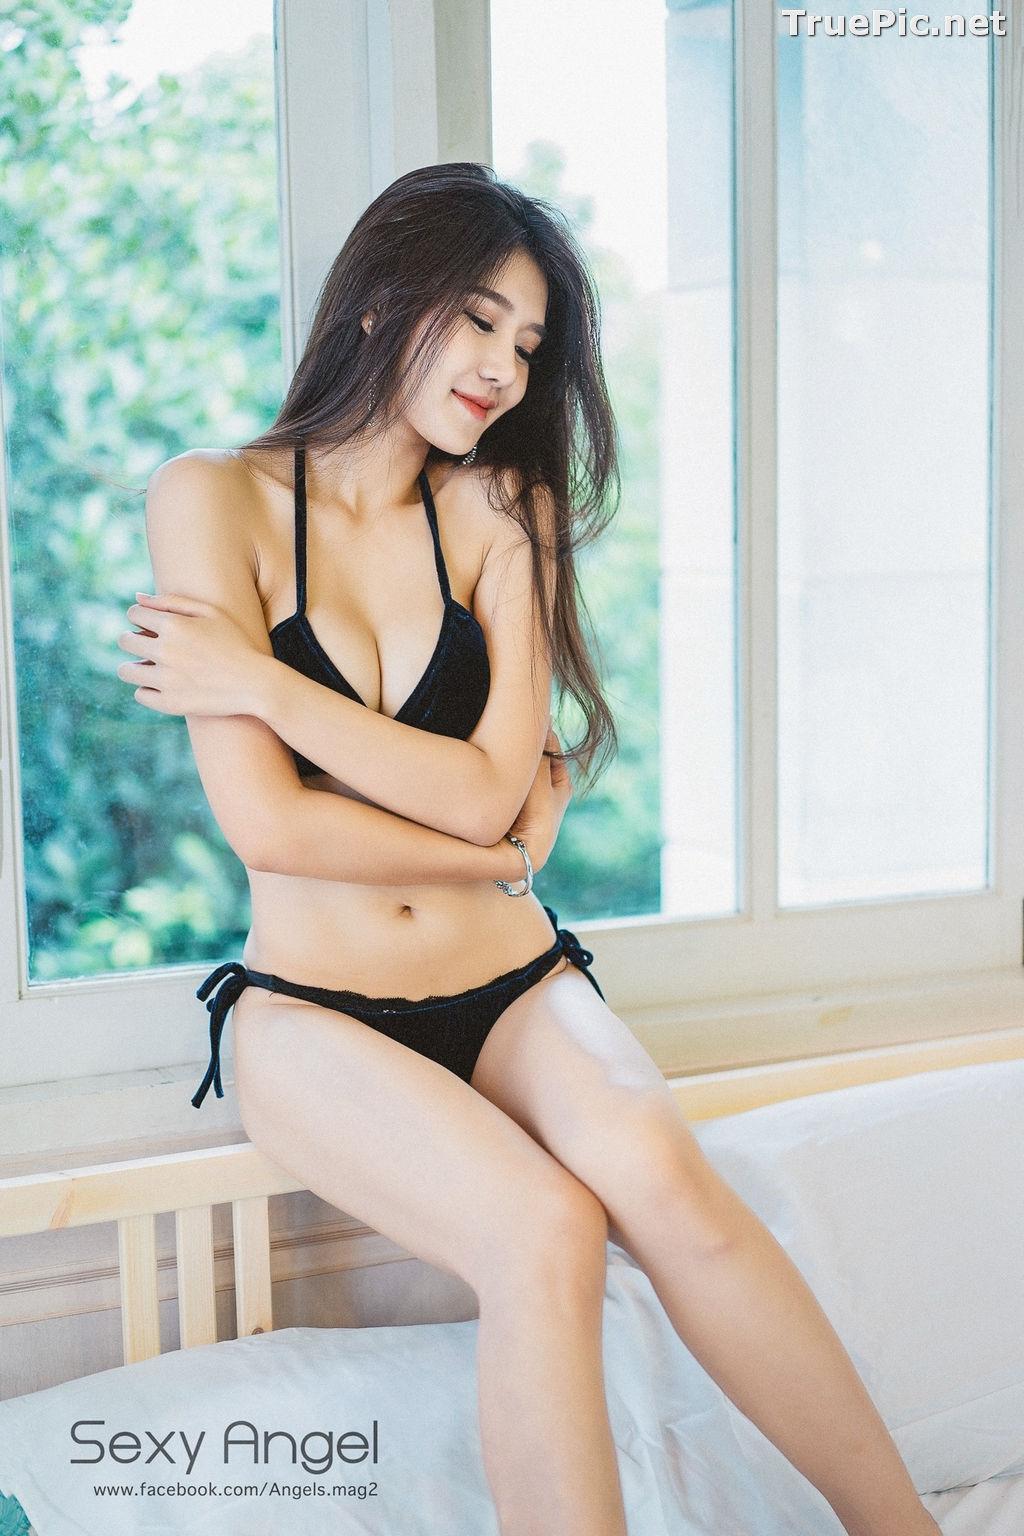 Image Thailand Model - Saruda Chalermsaen (EveAva) - Sexy Bikini Angel - TruePic.net - Picture-12